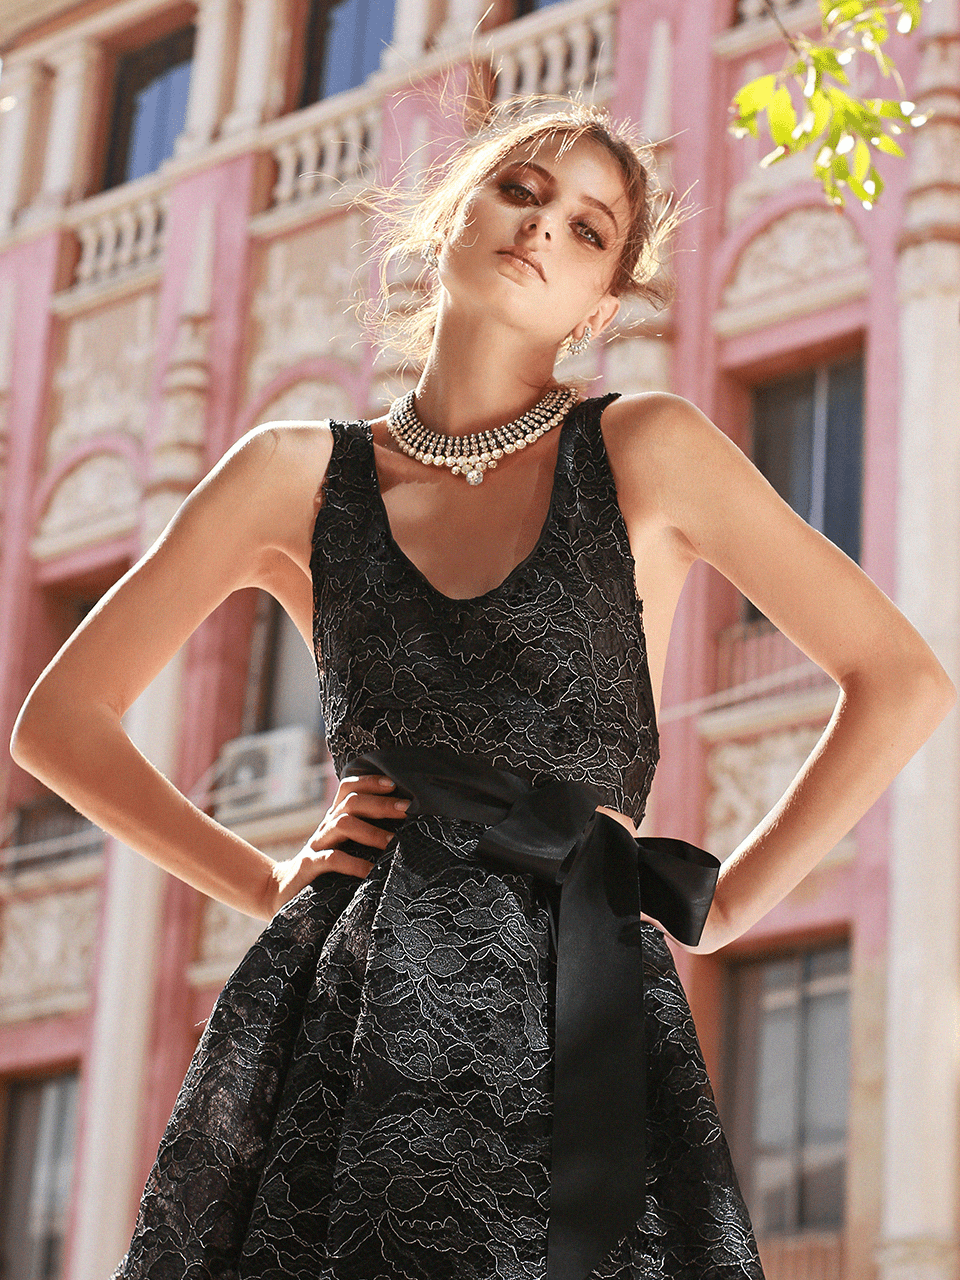 model-02-black-dress-alluring-yoenpaperland